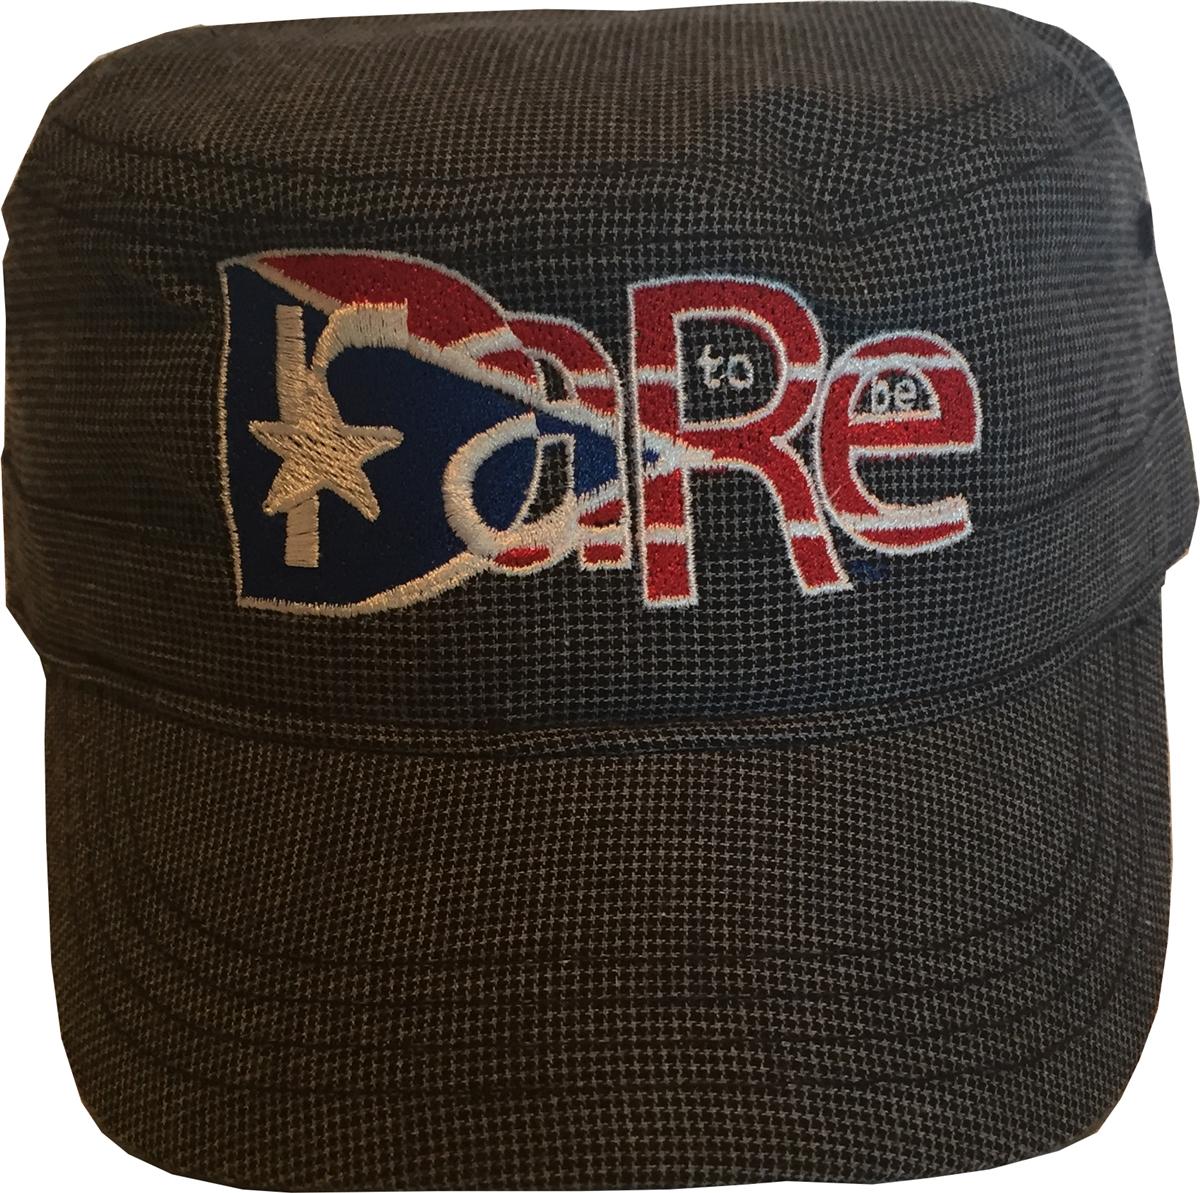 fb19bafe91b ... best price navy military hat with pr dtbr logo d62bb 00917